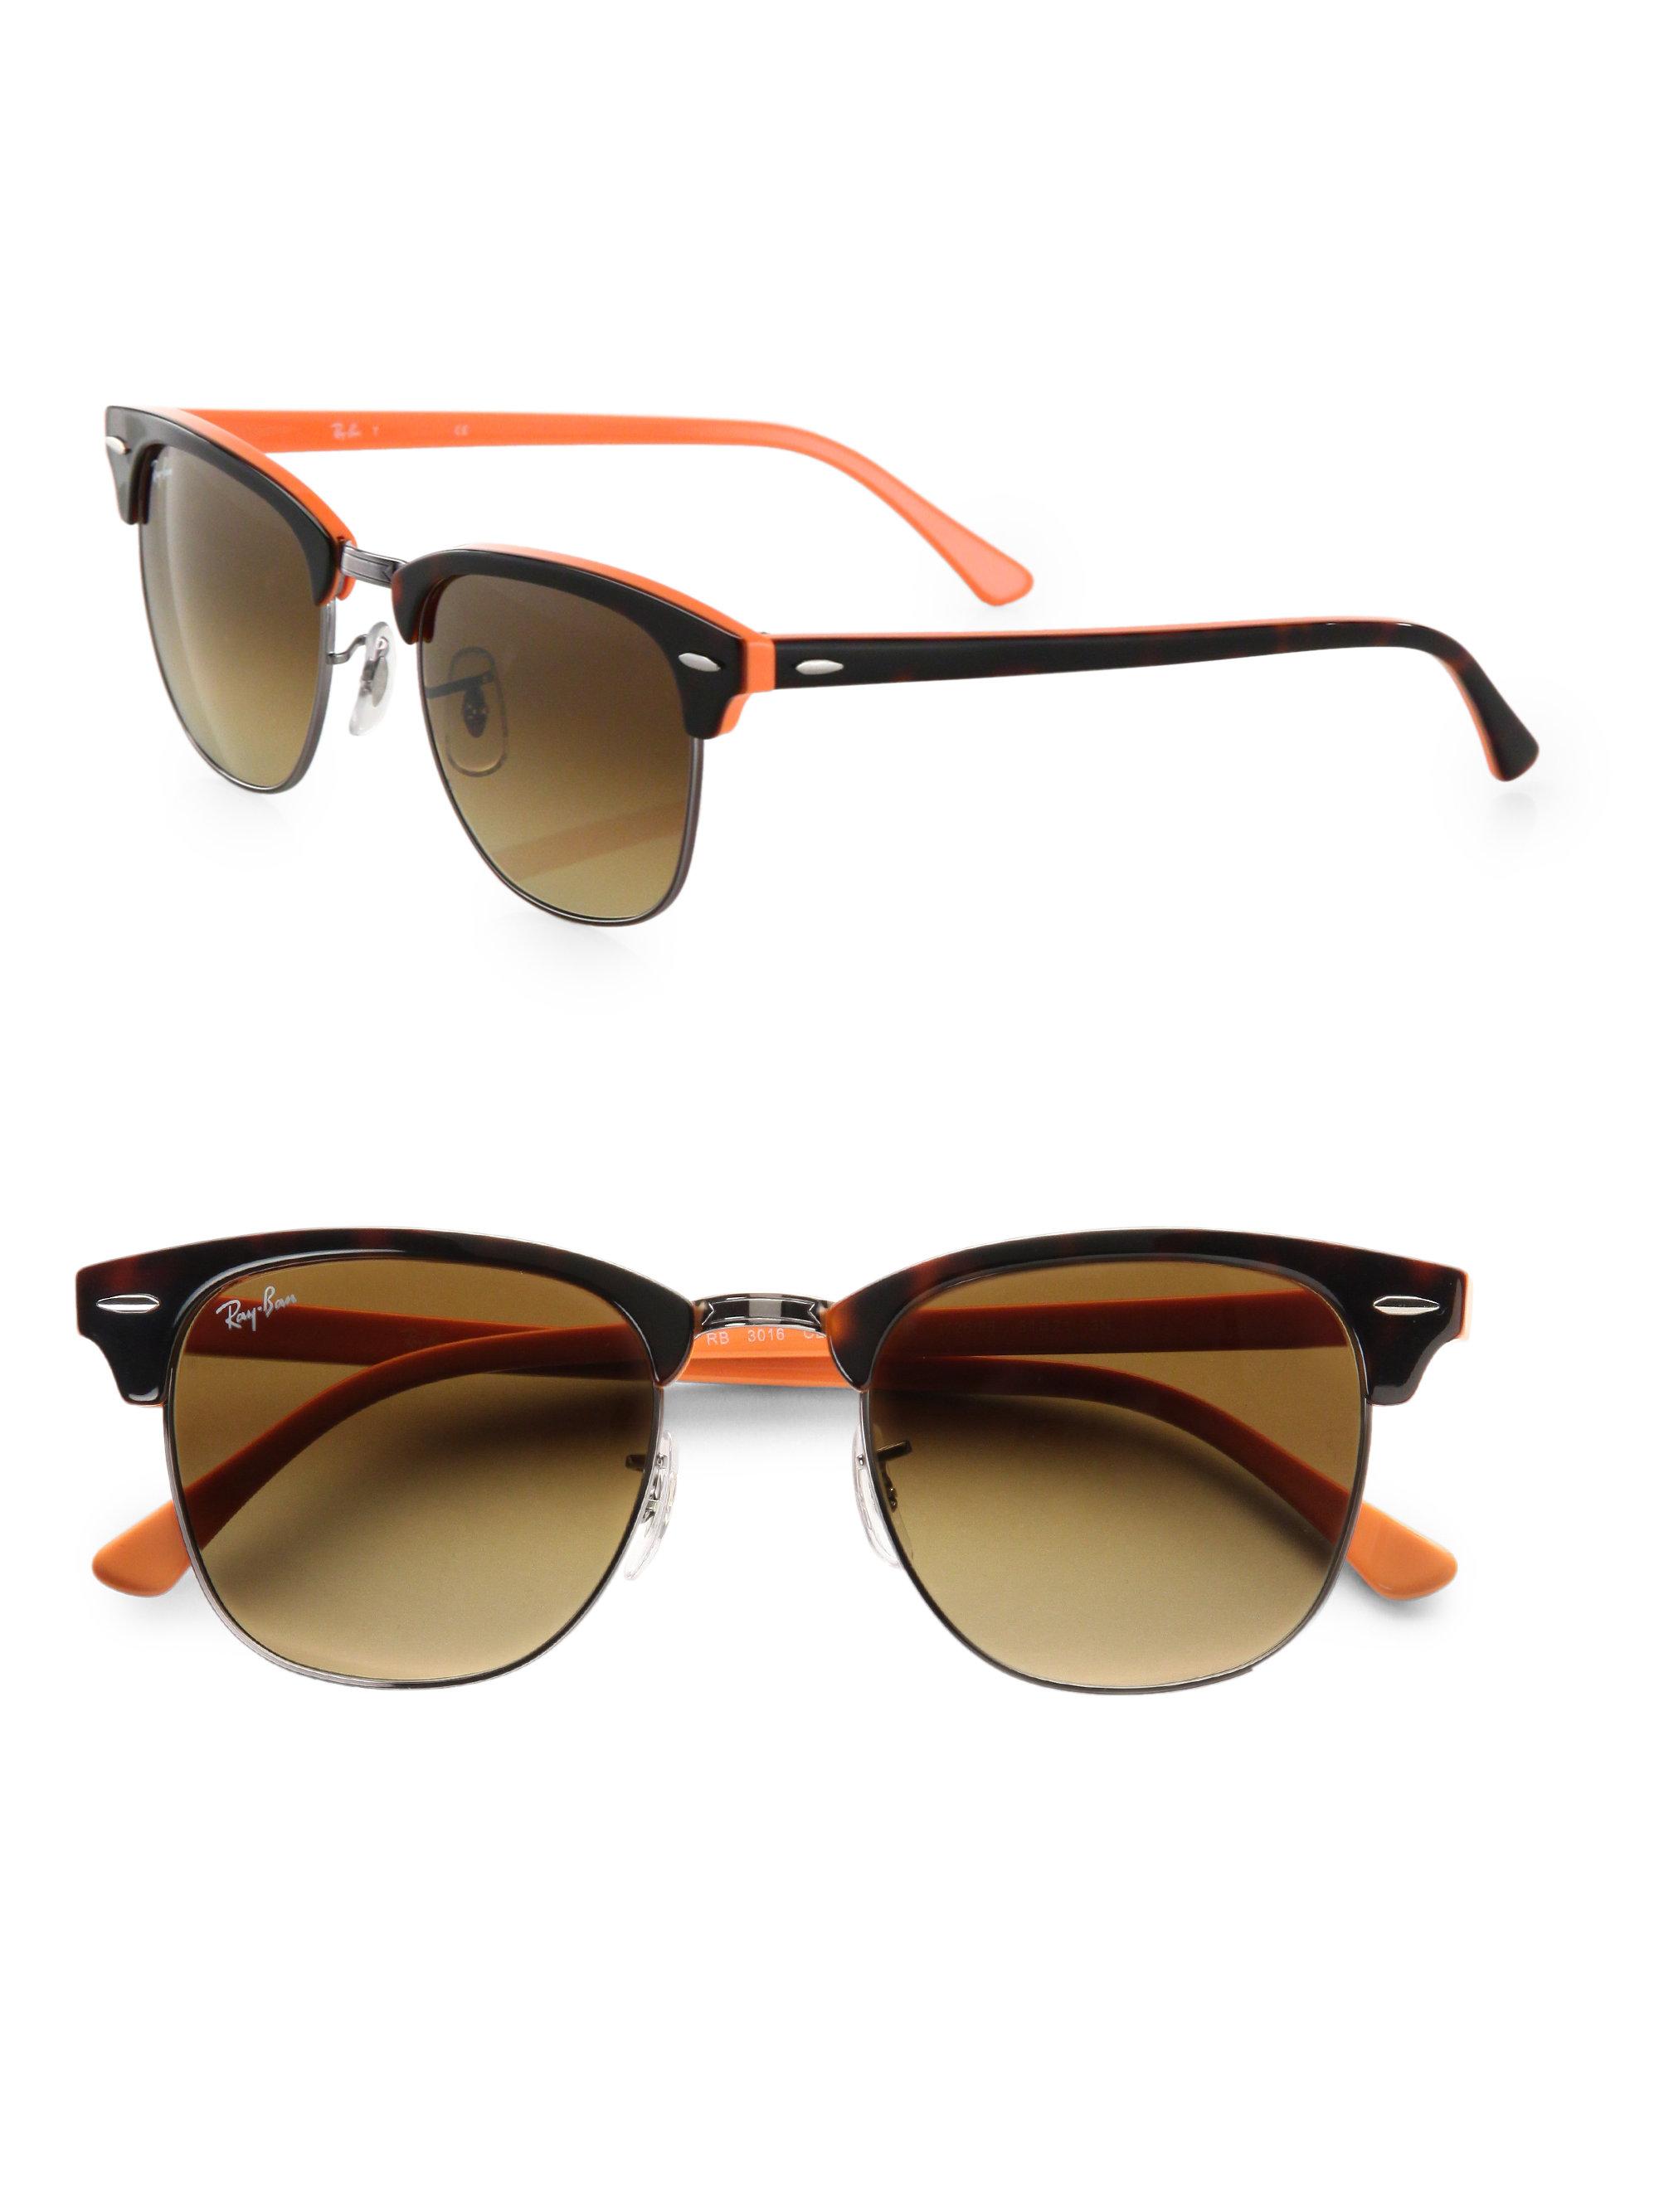 609cf806519 Gallery. Previously sold at  Saks Fifth Avenue · Men s Purple Sunglasses  Men s Blue Sunglasses Men s Ray Ban ...